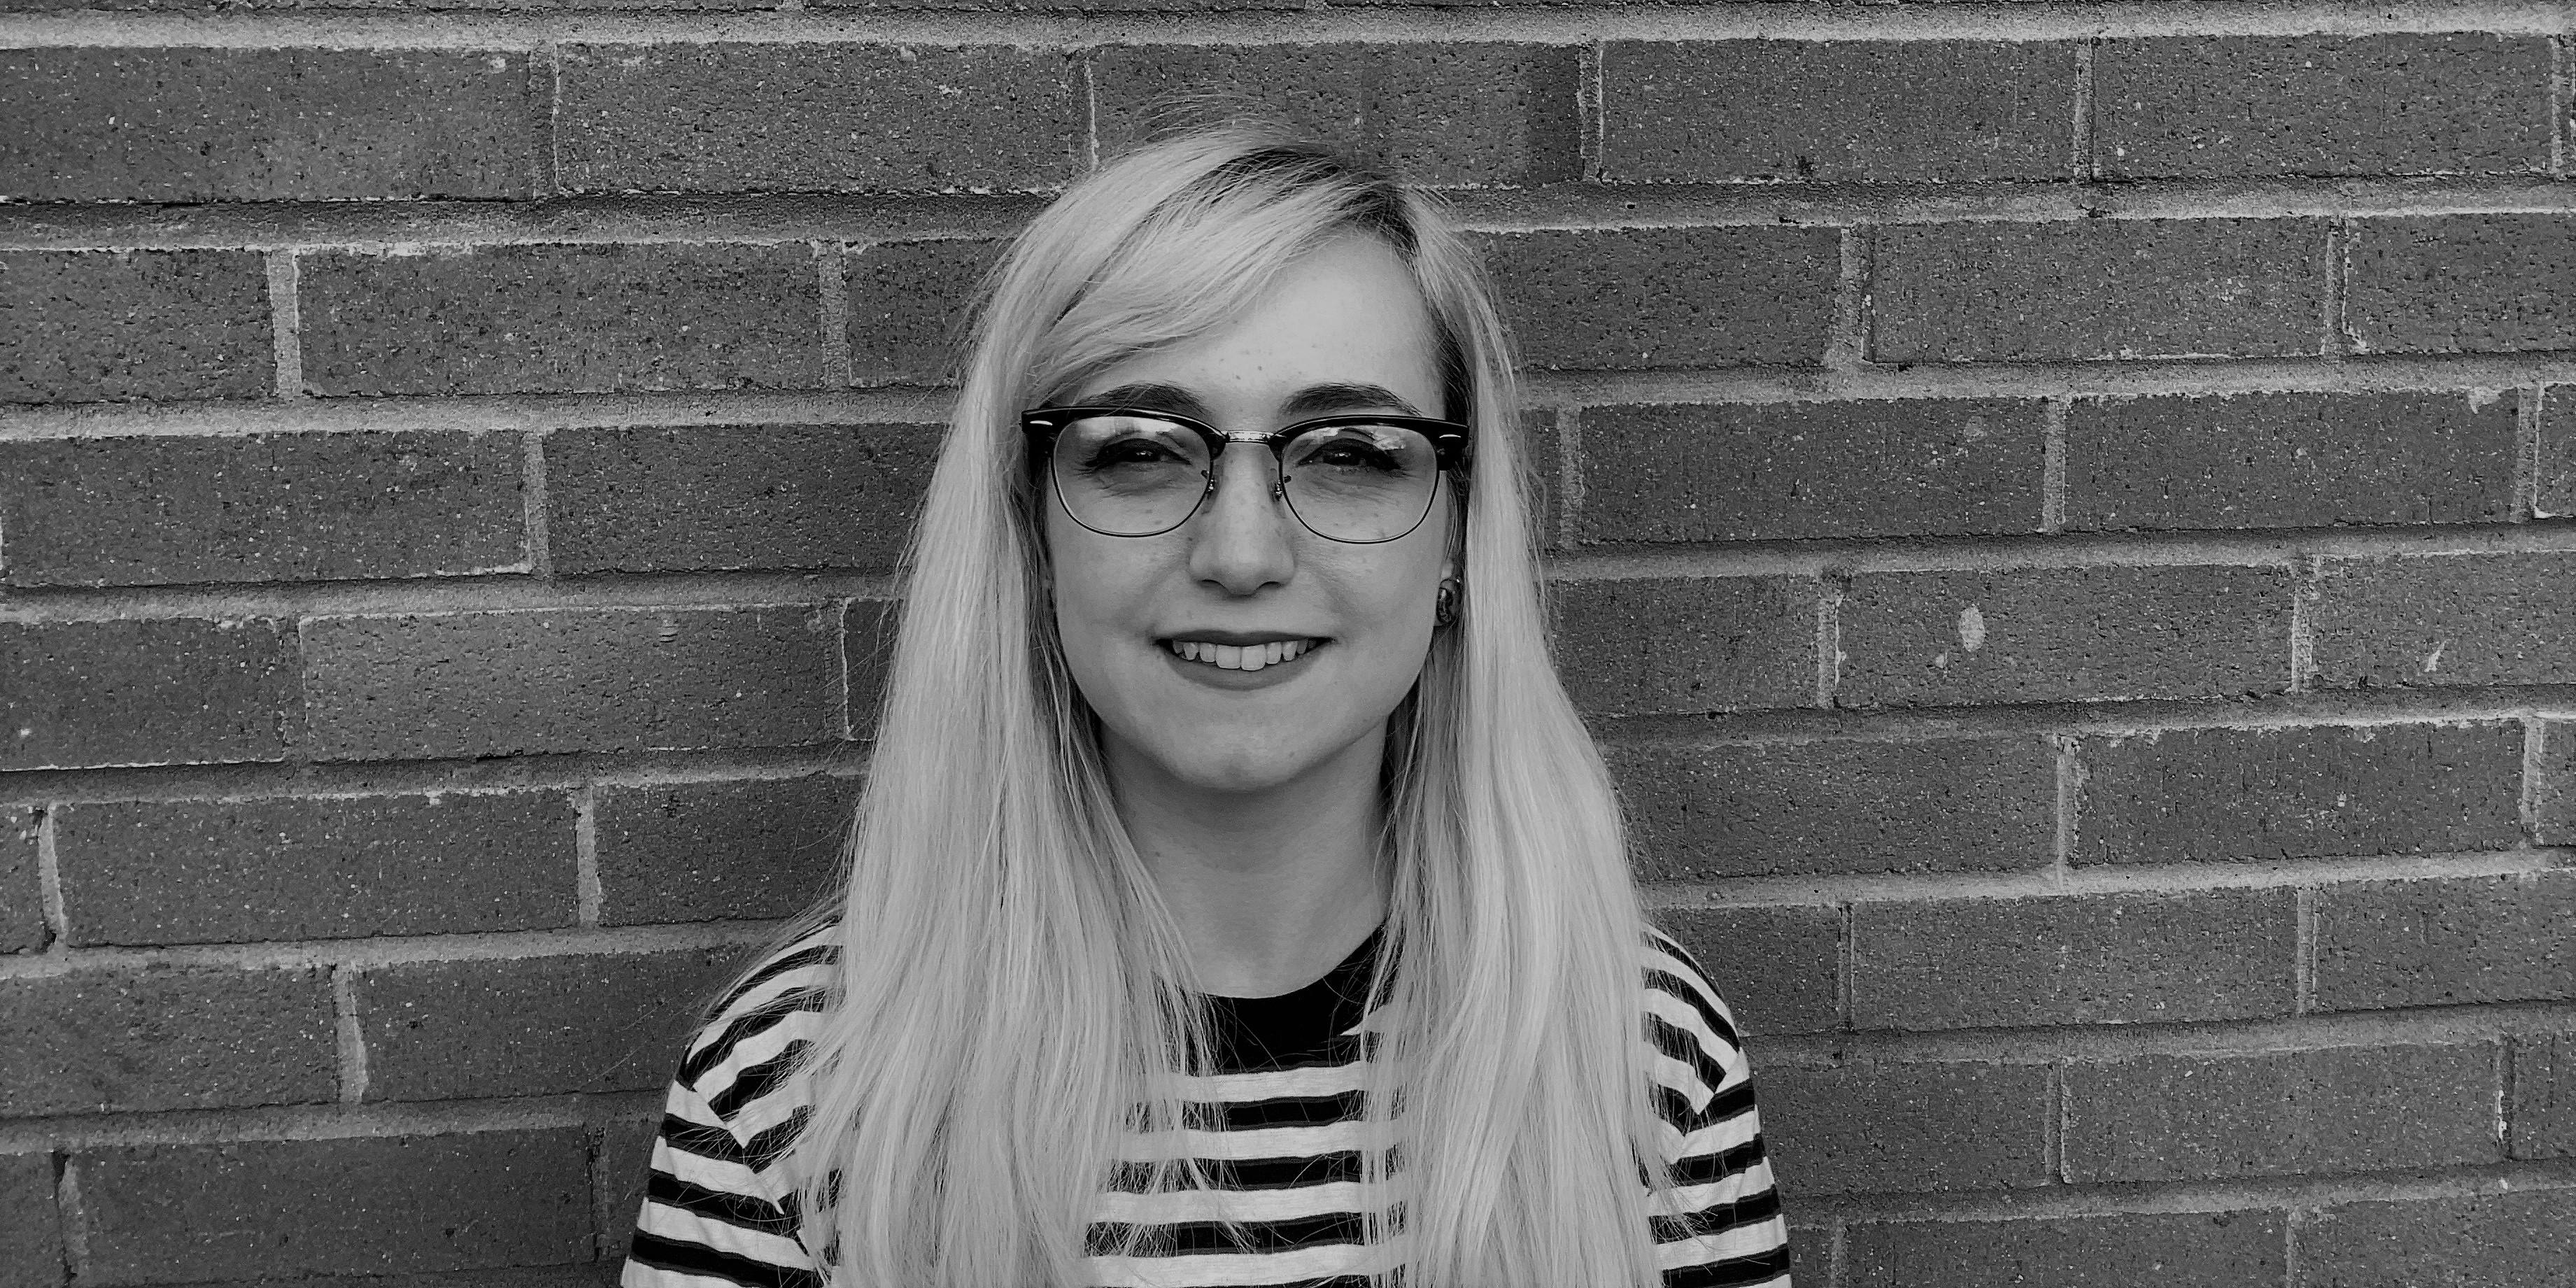 Meet ClickThrough's Marketing & Content Executive, Megan Carthy